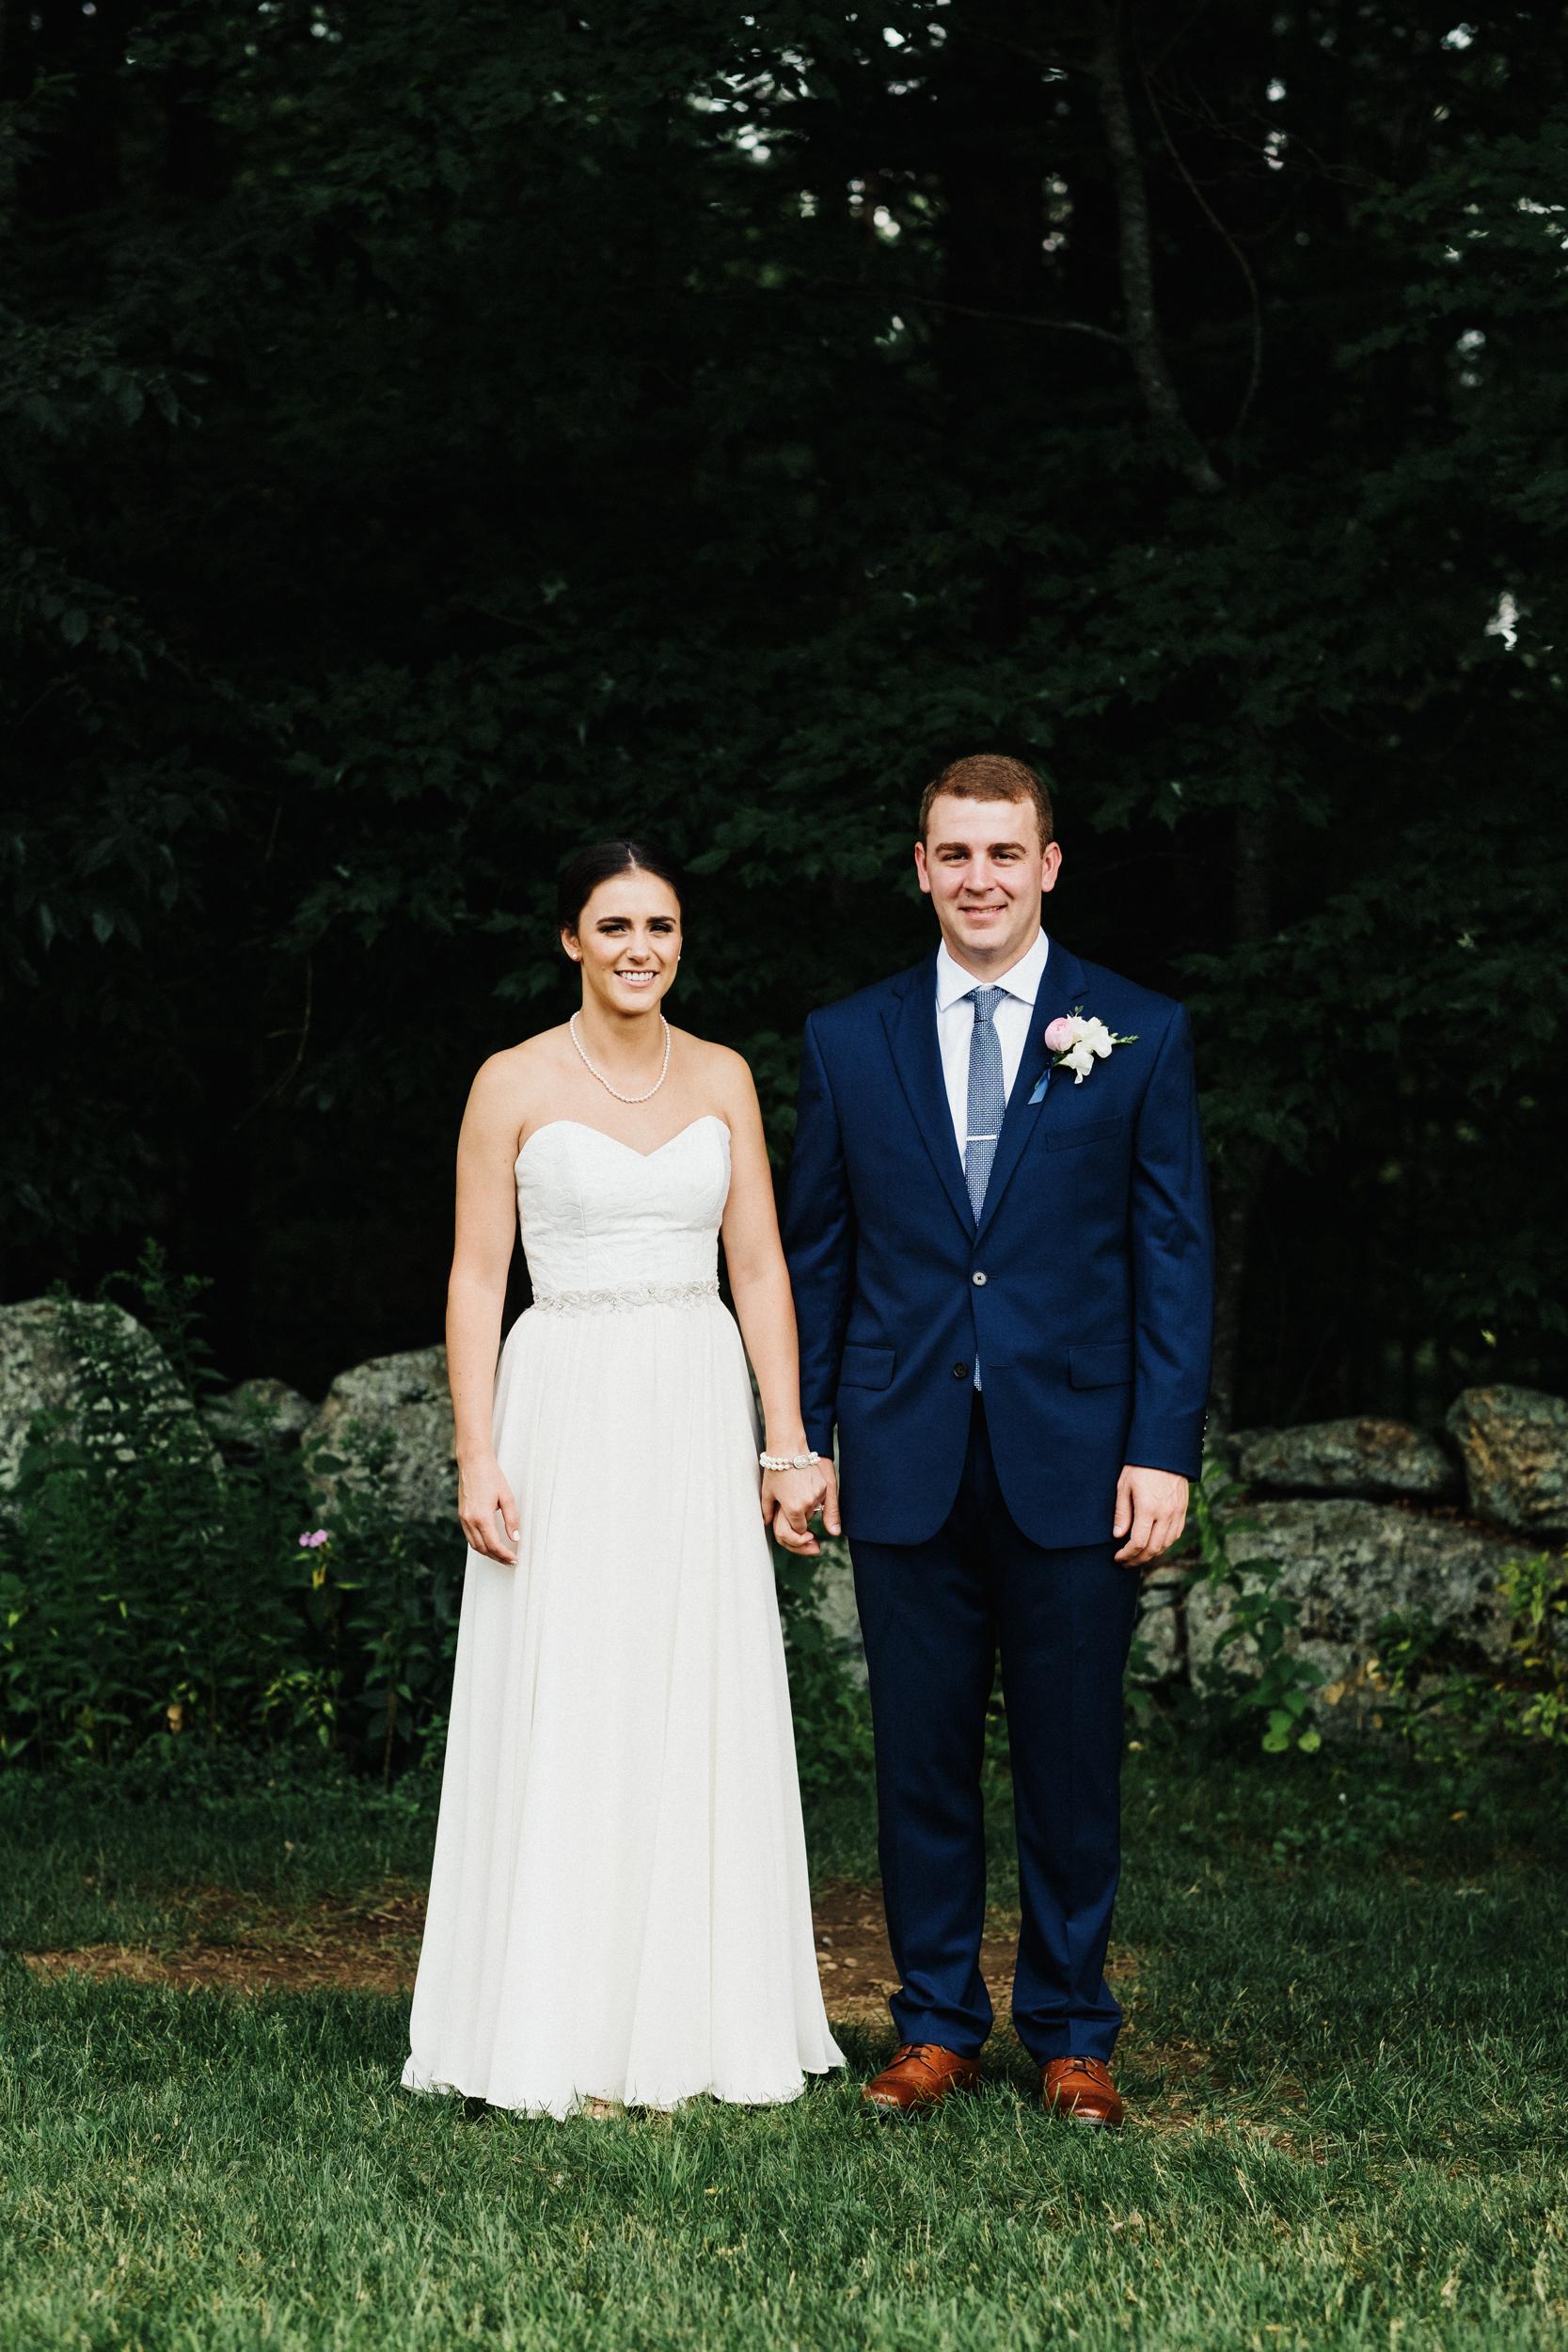 Wedding_Francis_Boucher_zukas_farm_2018-28.jpg